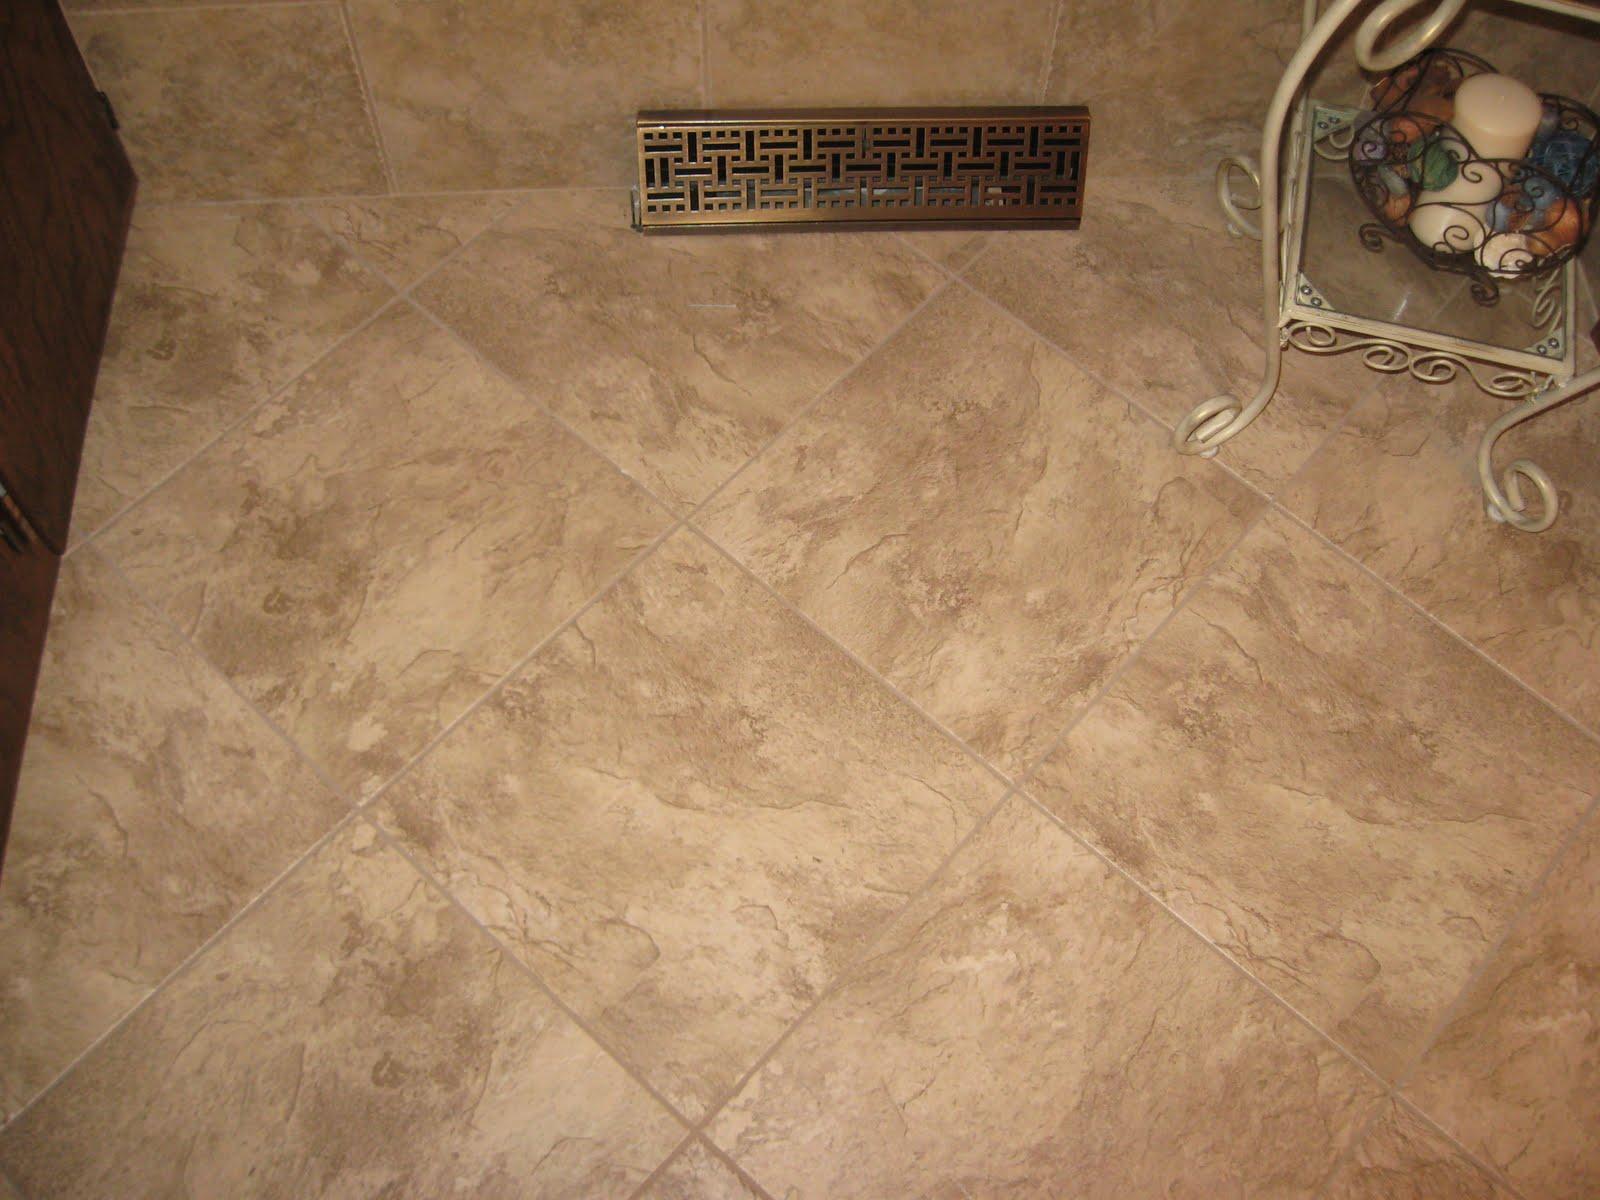 Big Kraut Construction: Bath in Tile and Dura Ceramic